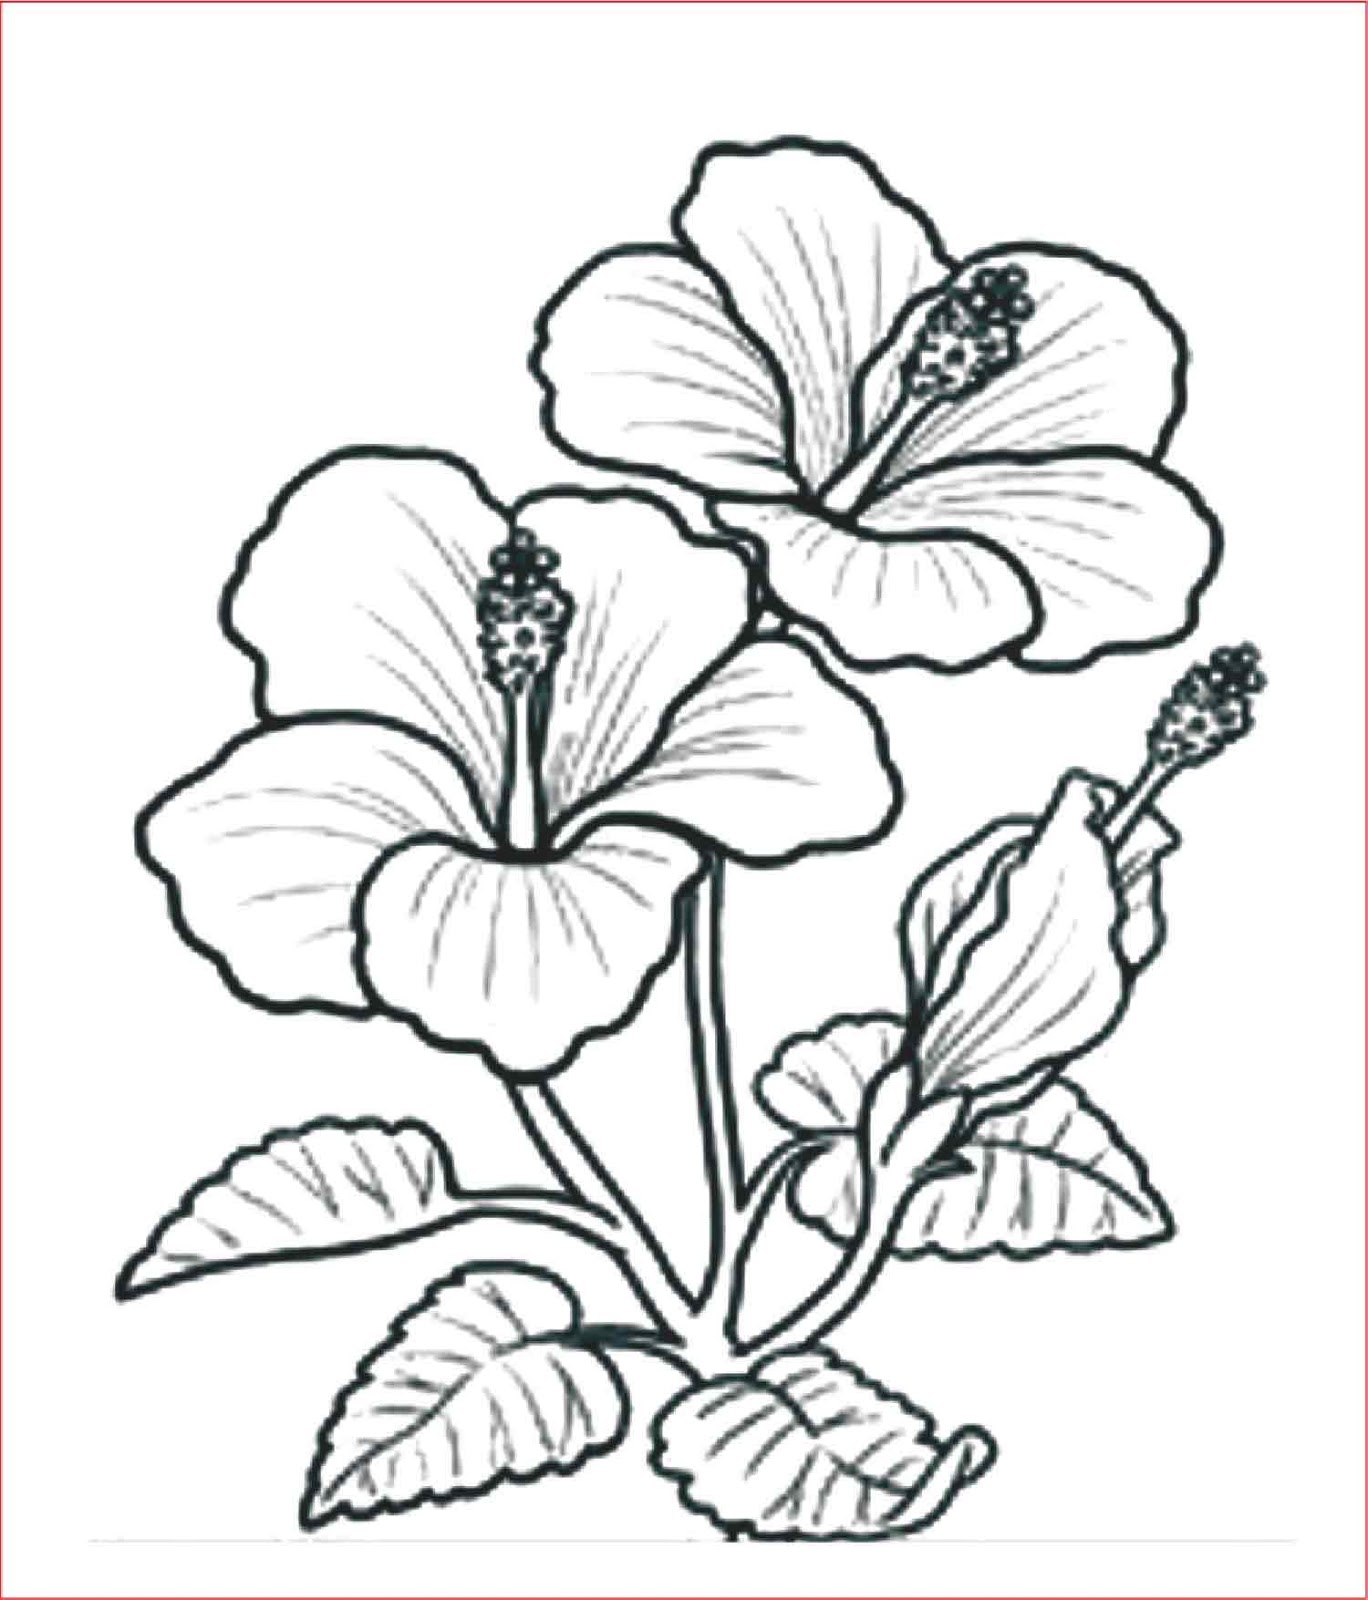 30 Gambar Sketsa Bunga Mudah Bunga Matahari Mawar Tulip Sakura Teratai Sepatu Melati Dll Seni Budayaku